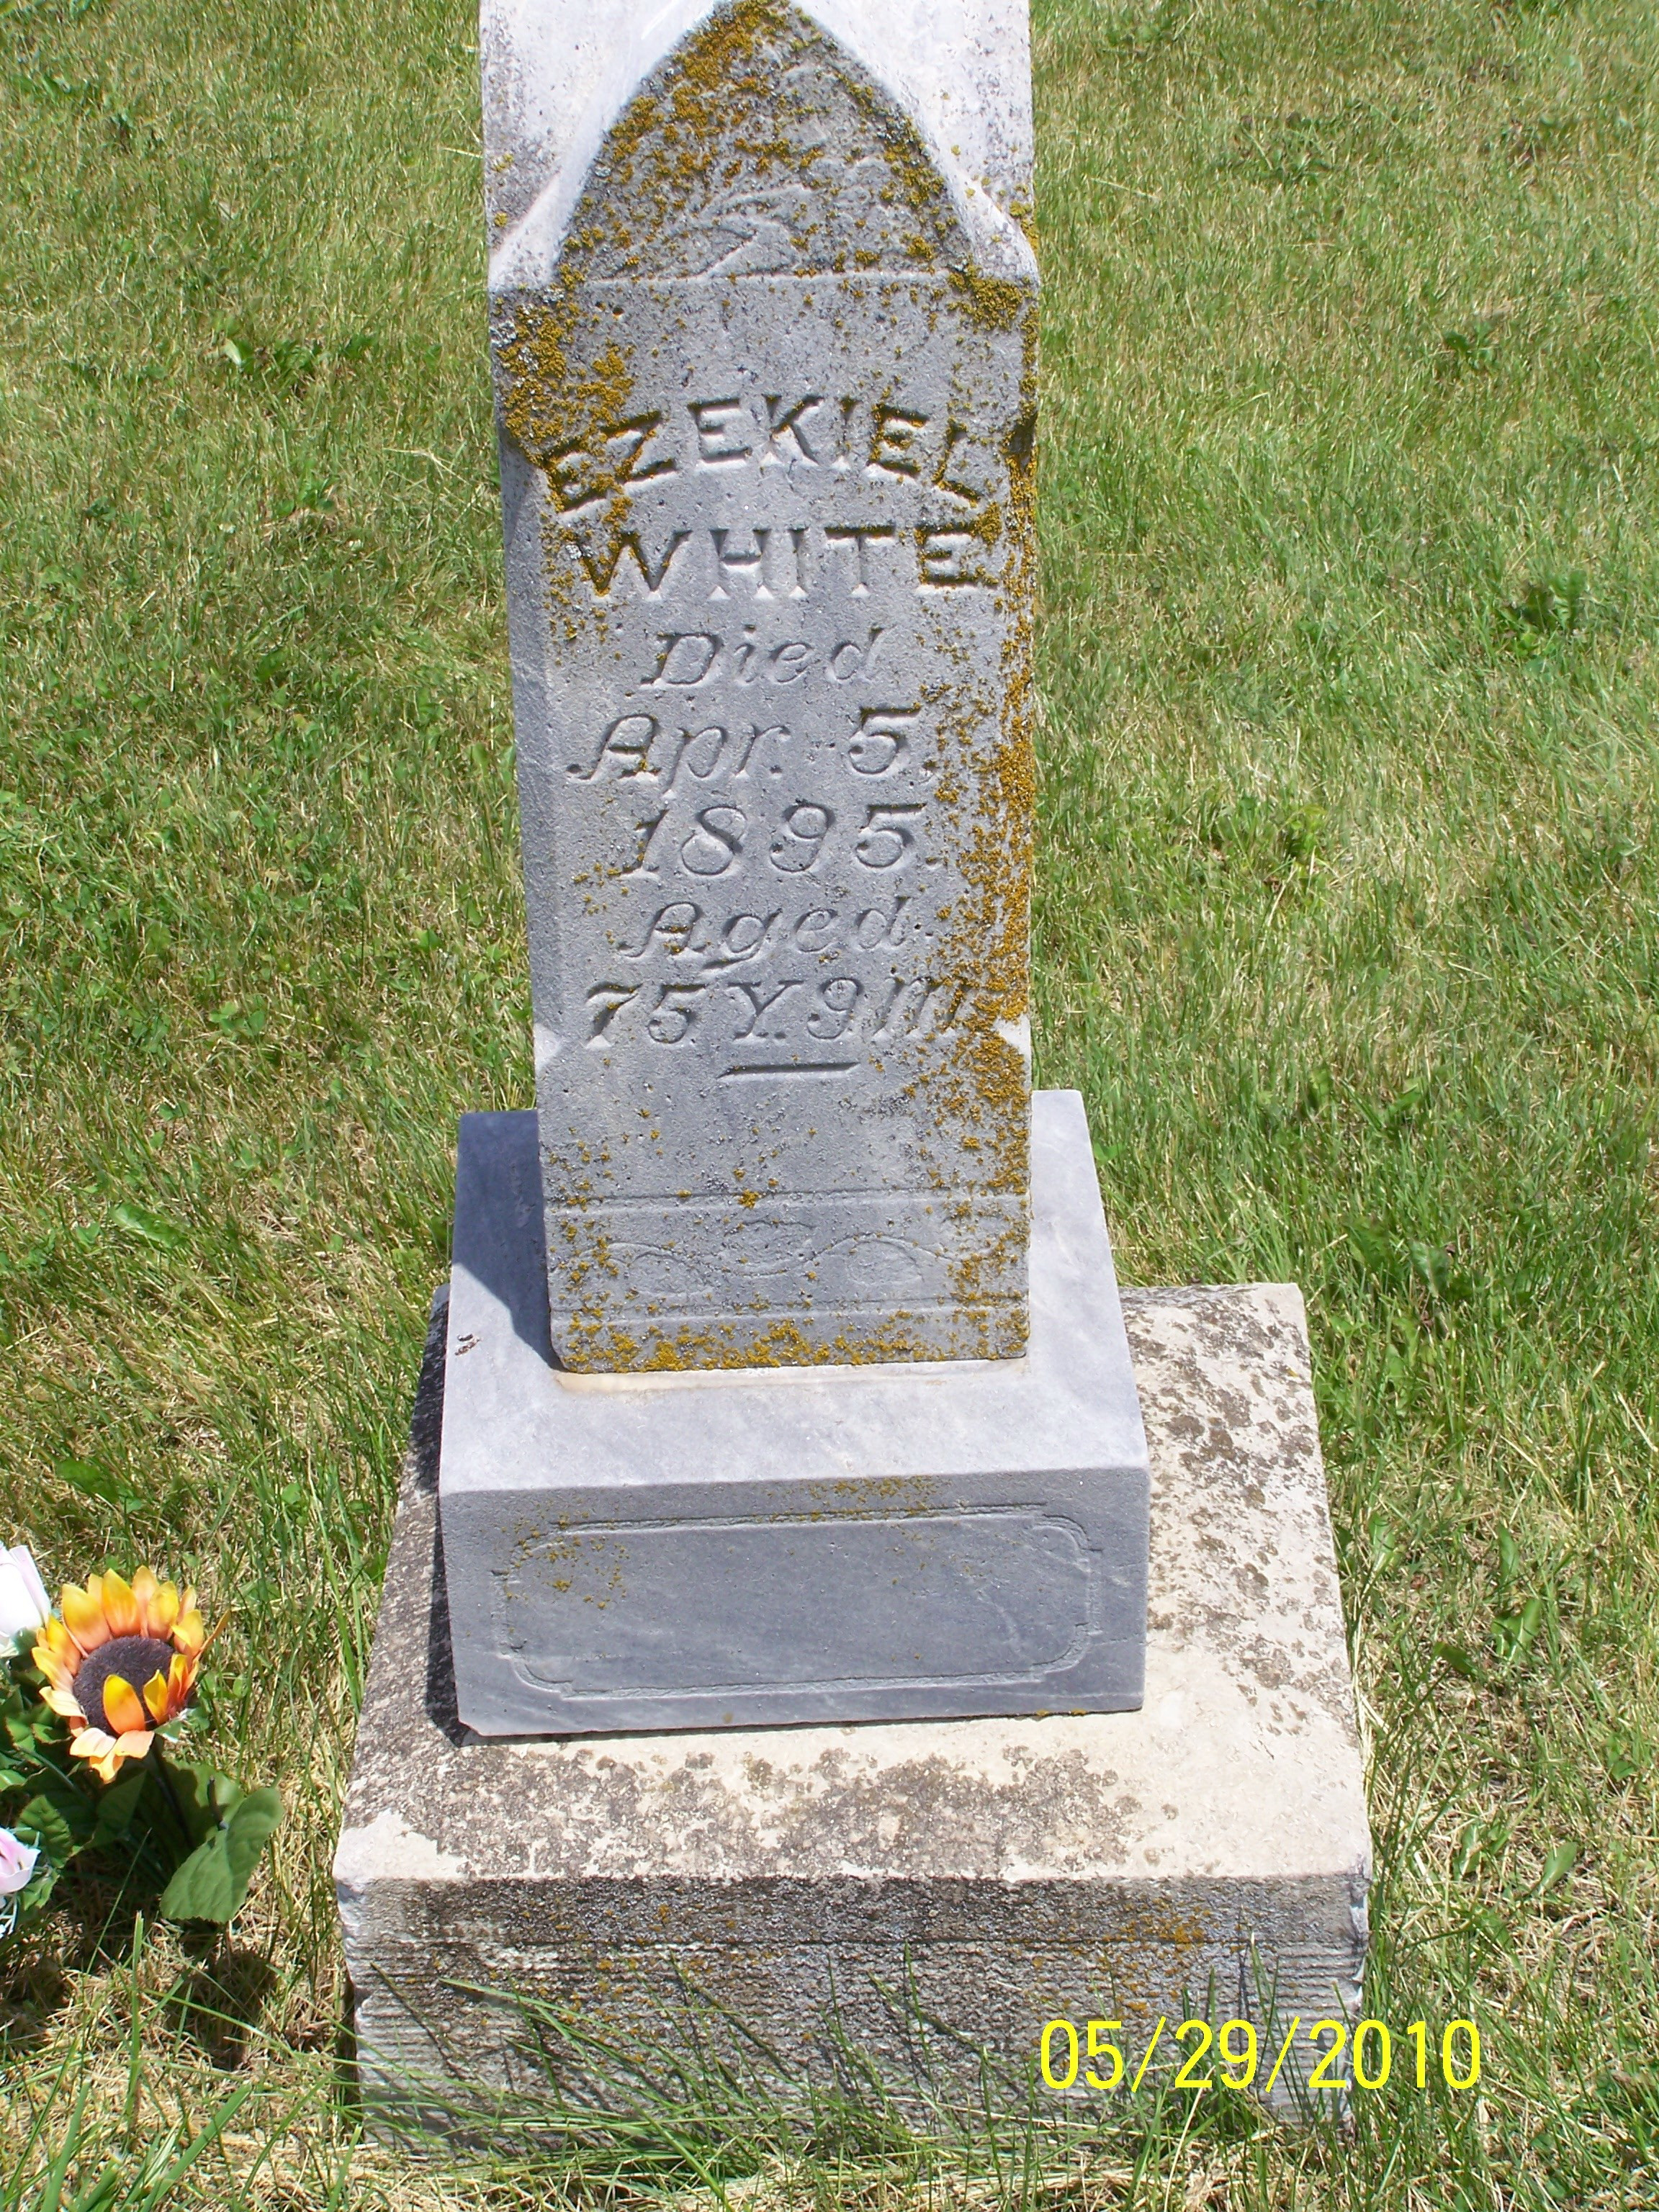 Ezekiel White